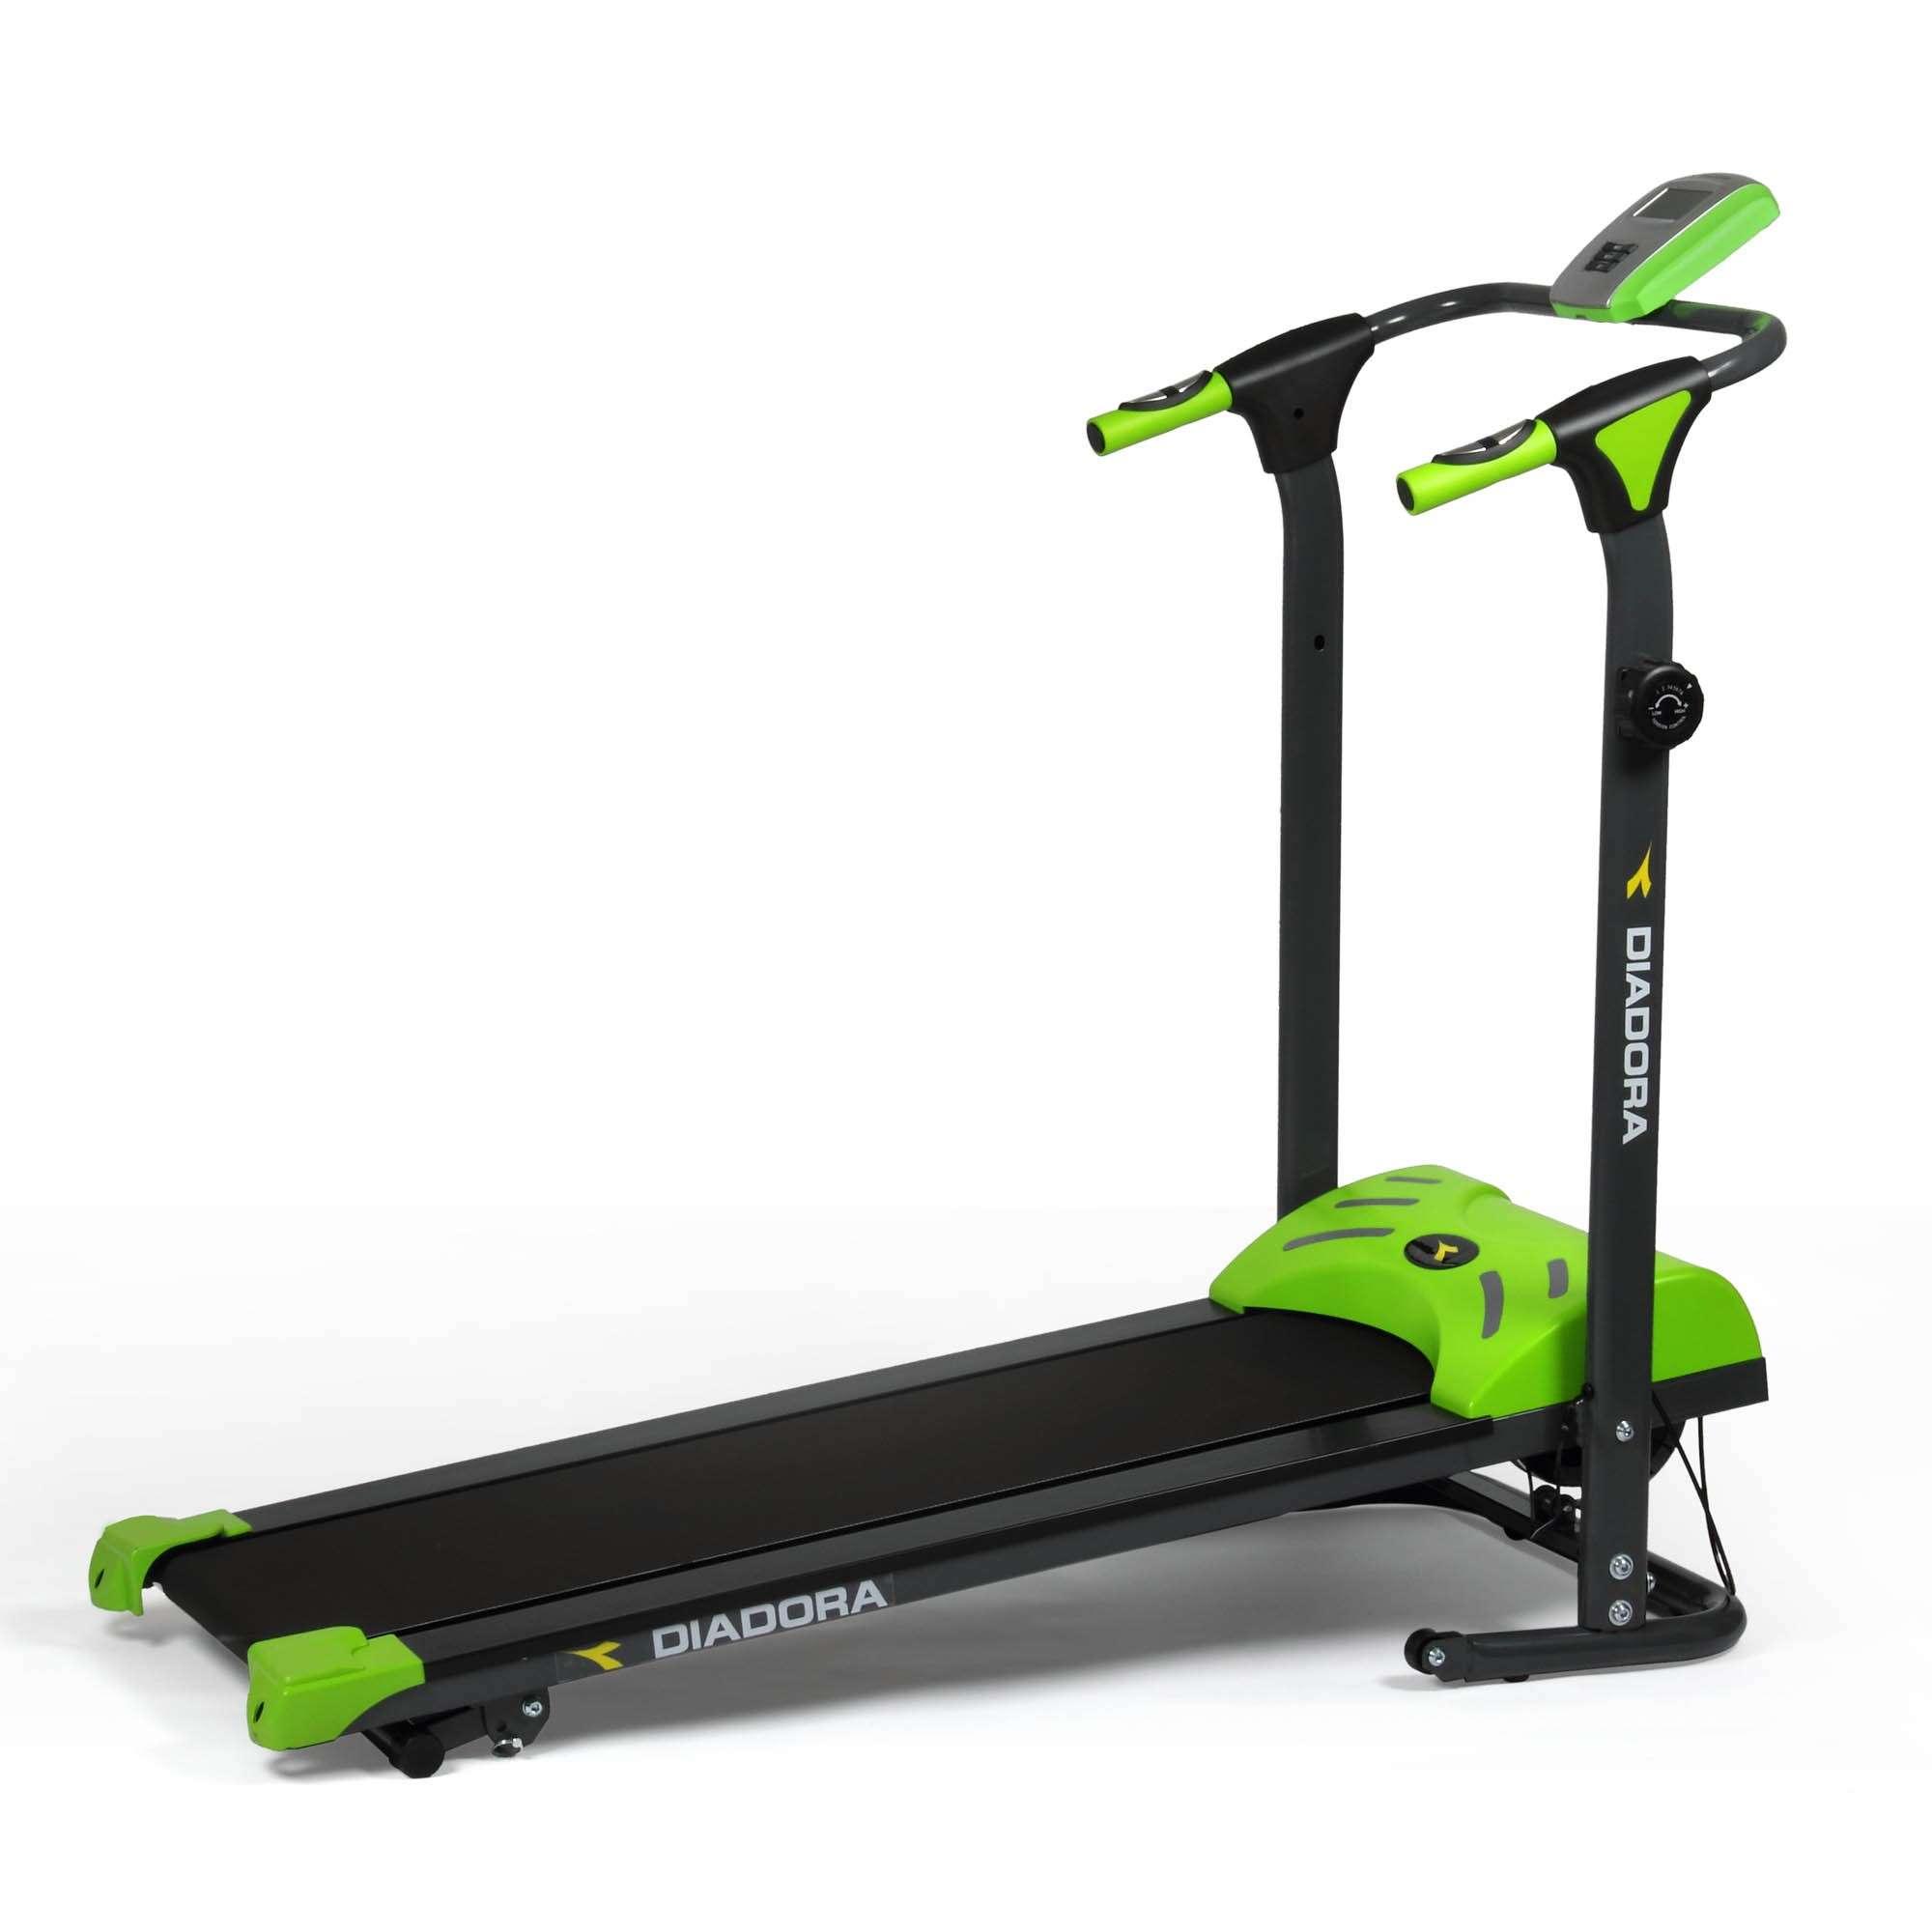 miglior tapis roulant magnetico: diadora fitness evo